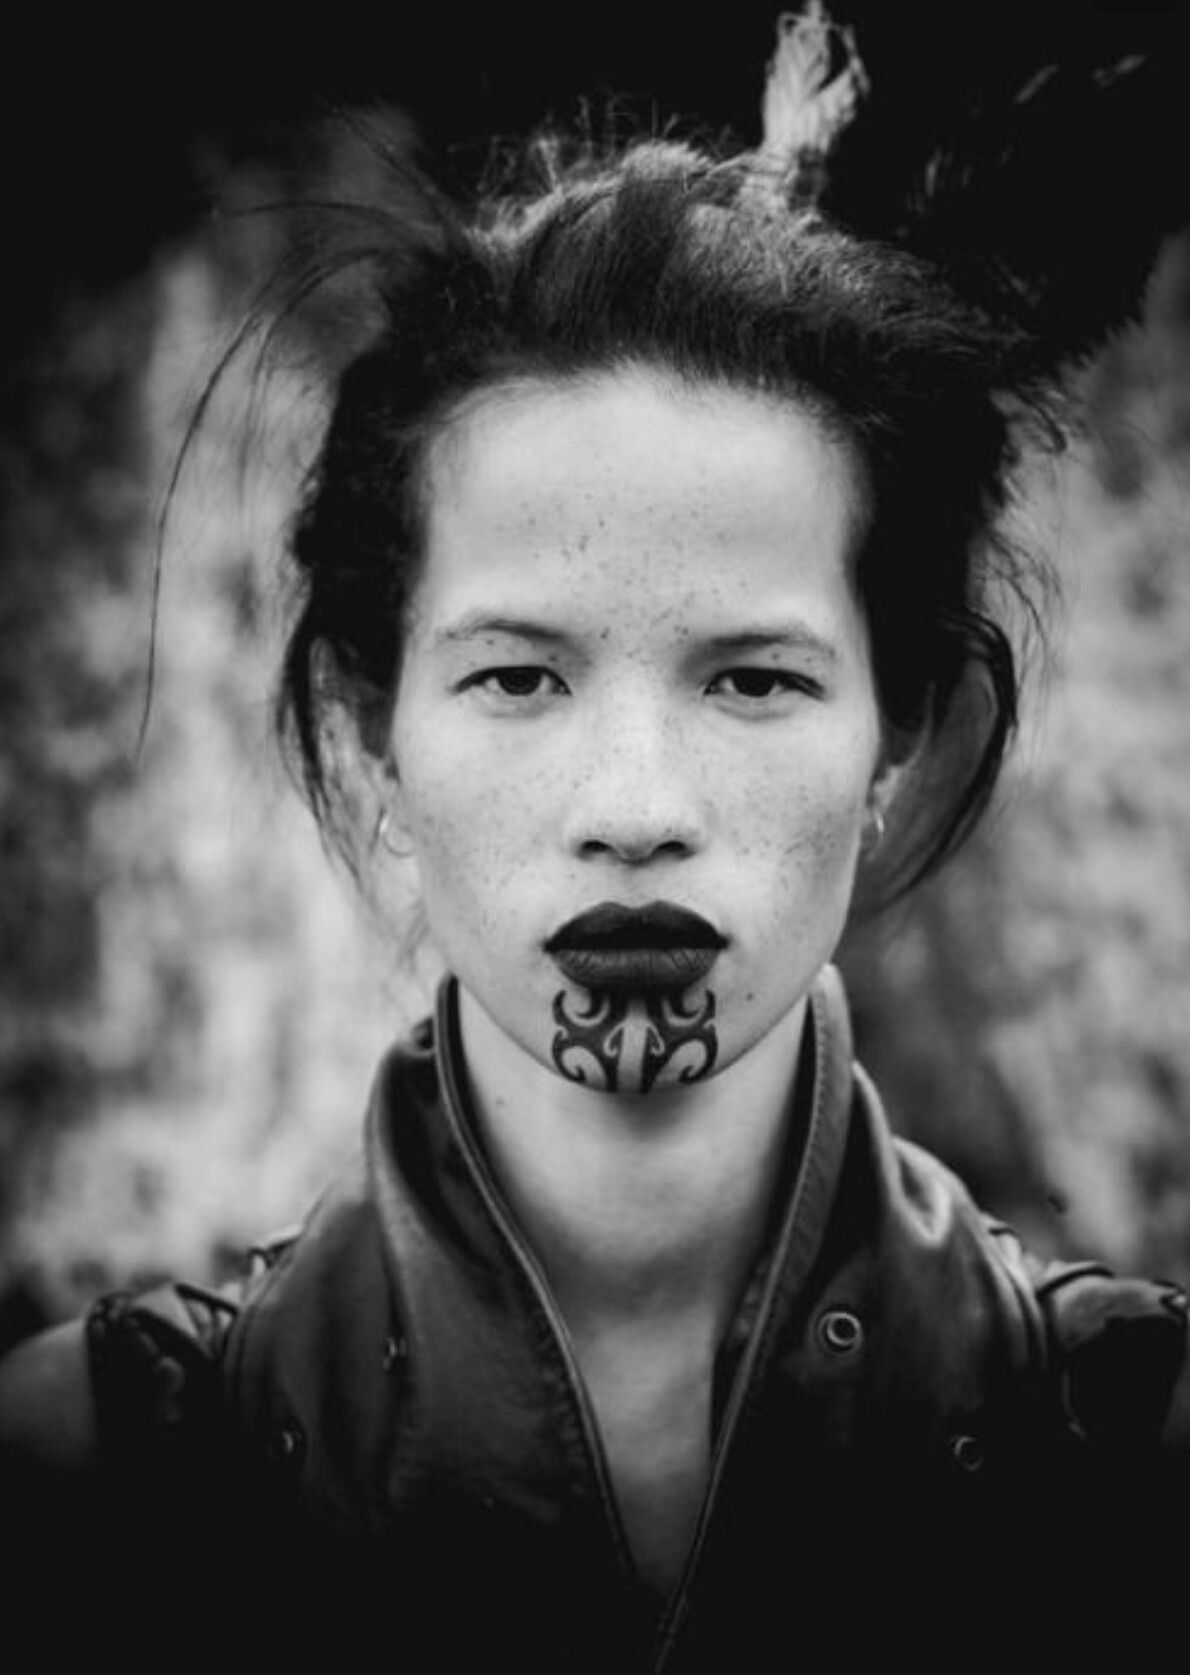 Pin by Catrin EllisBlair on passion Dandelion tattoo